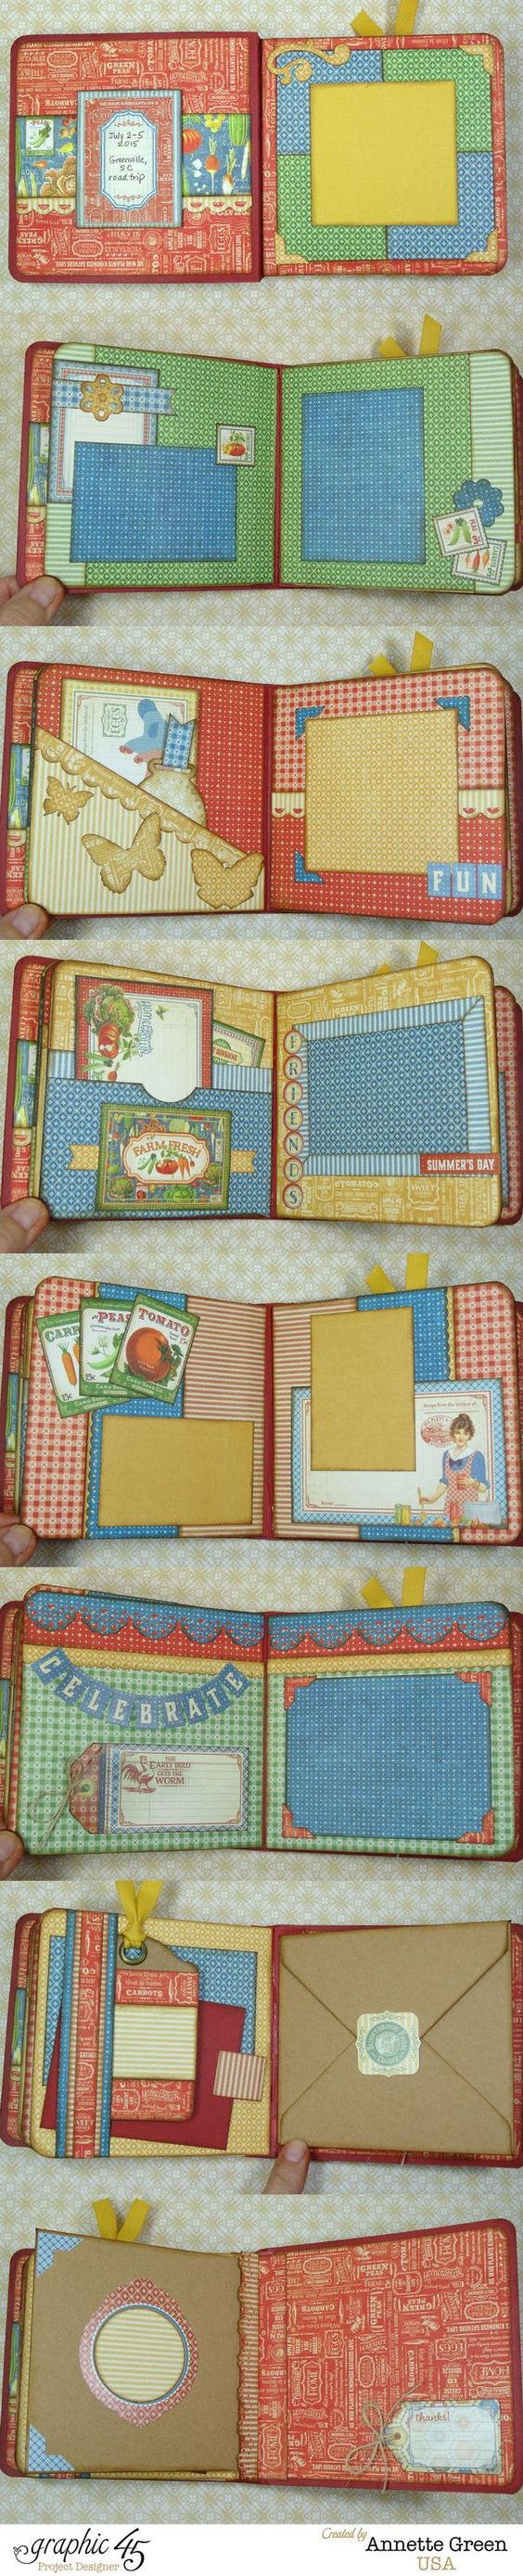 Inicio-Sweet-Home-mixtas-Box-Con-Album-Graphic-45-Spellbinders-Annette-Verde-01-de-11